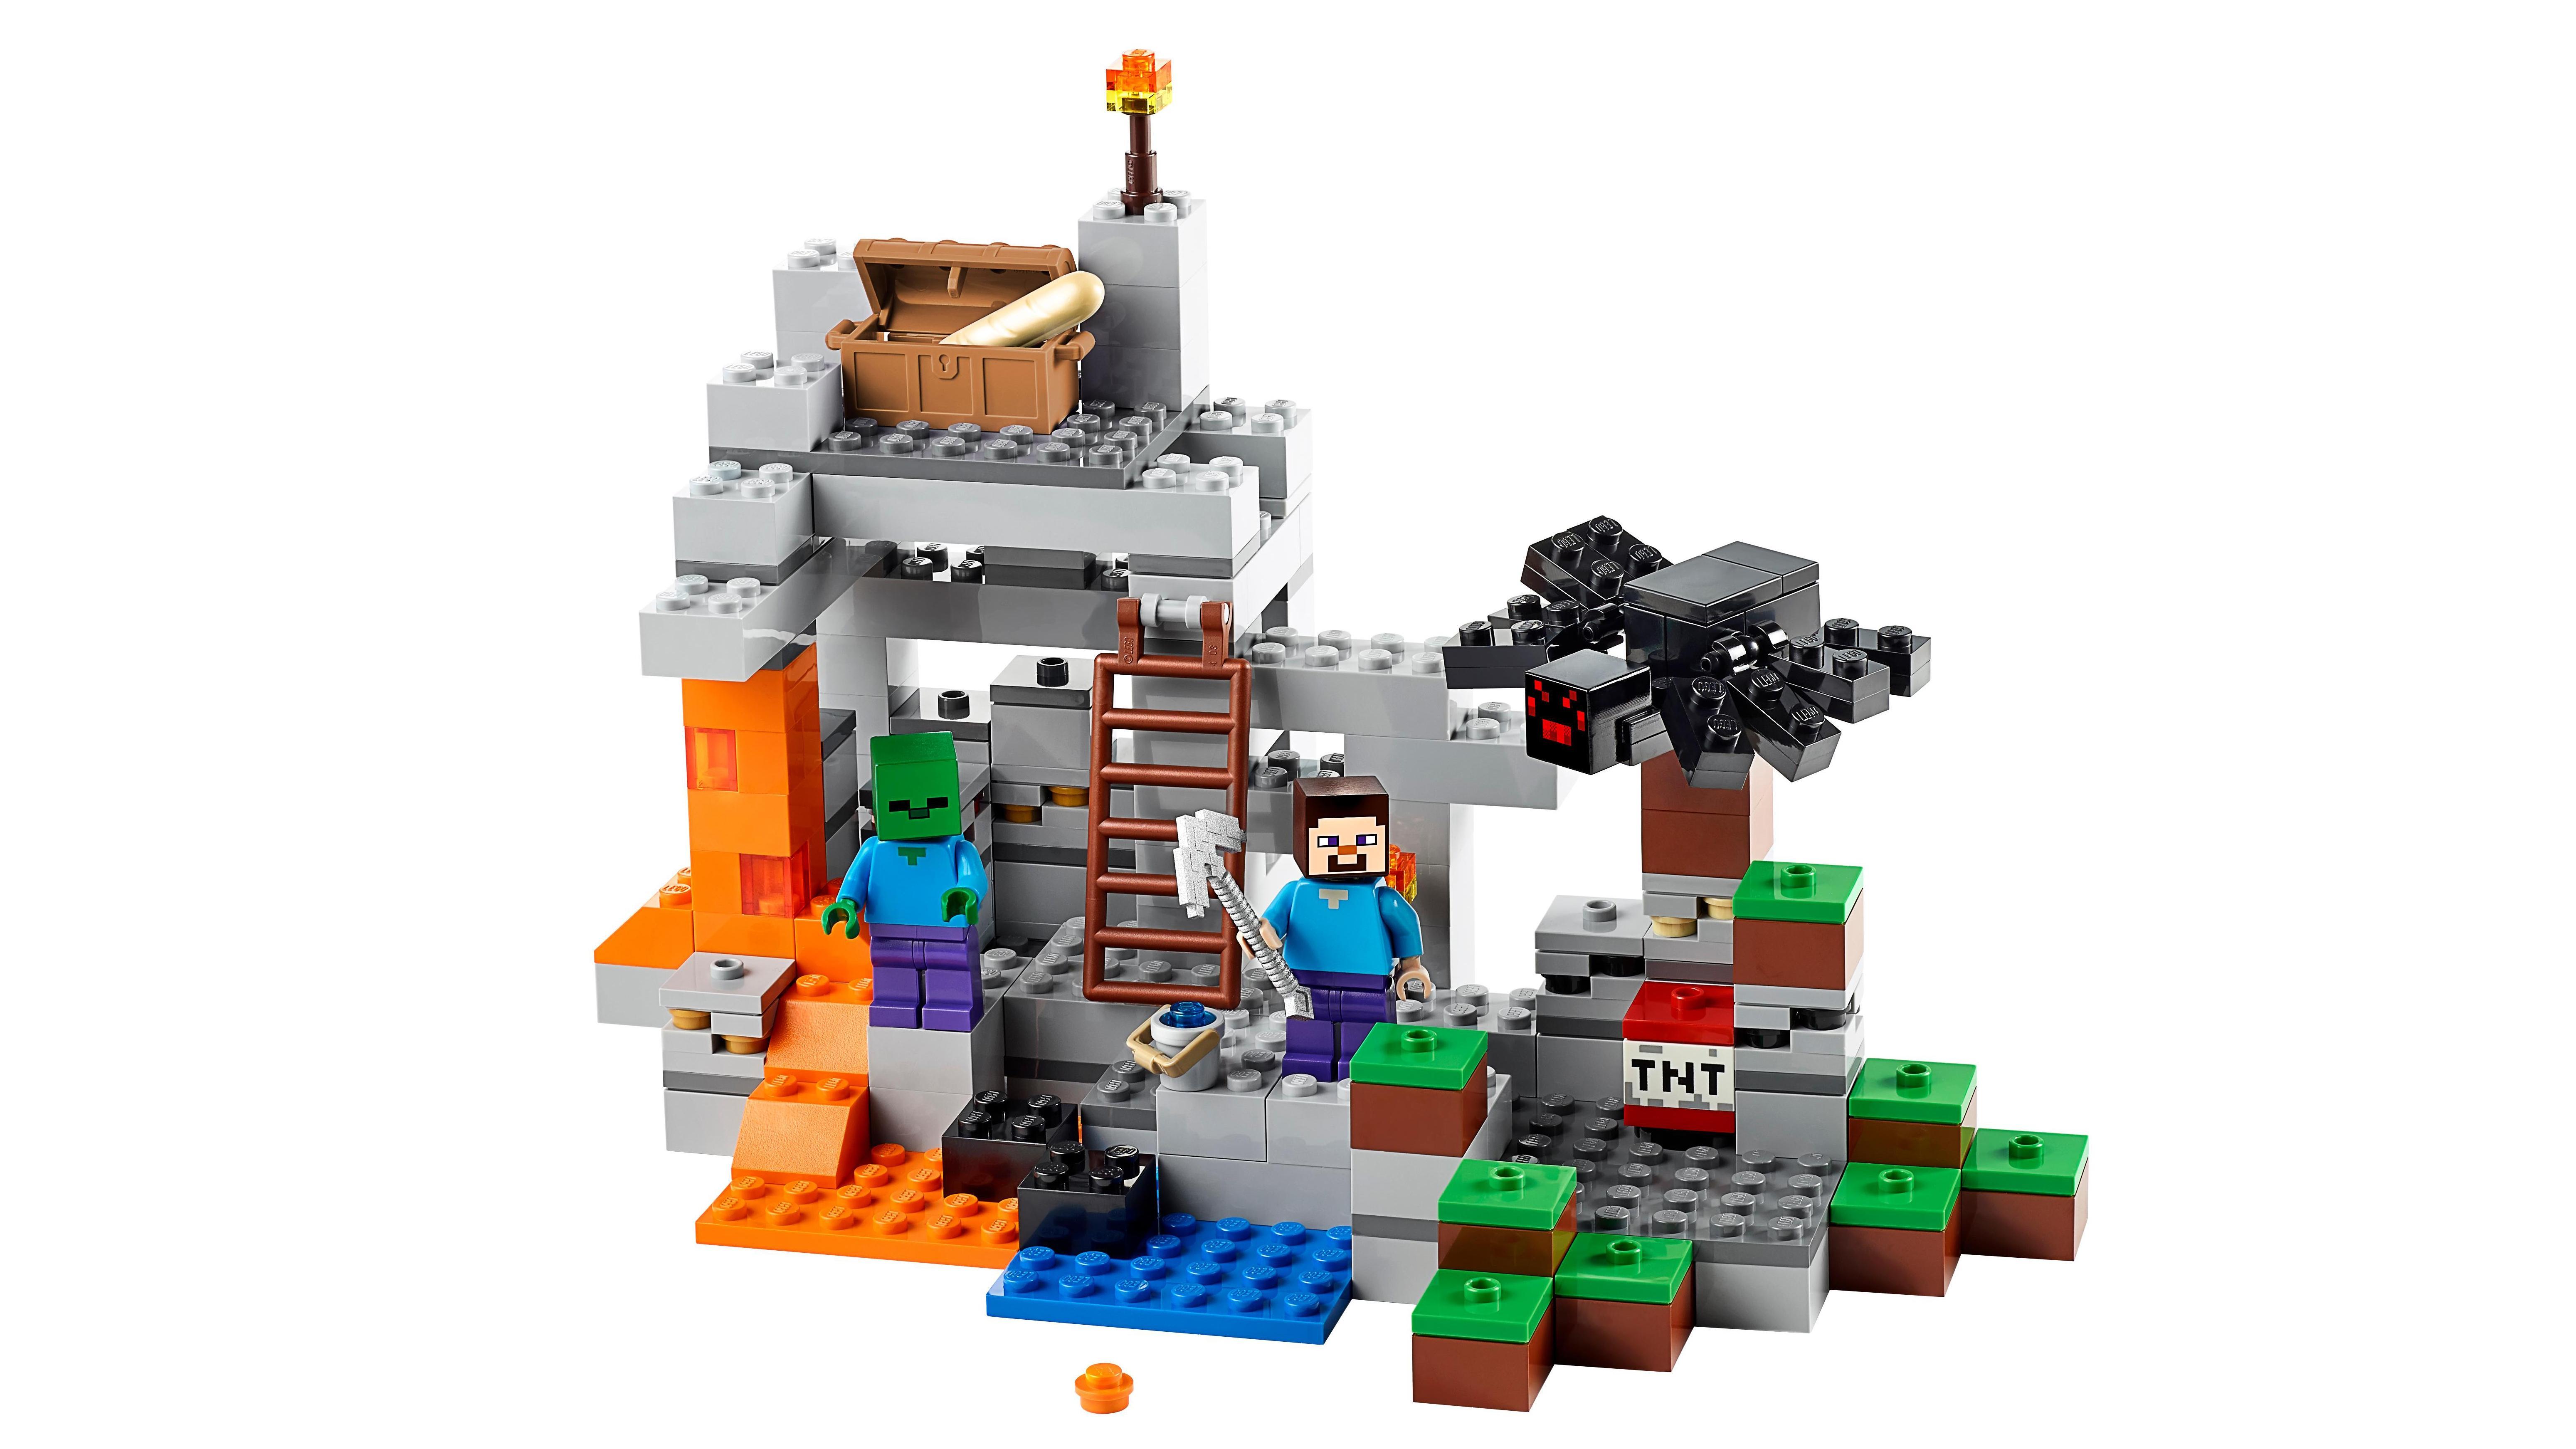 Amazon.com: LEGO Minecraft The Cave 21113: Toys & Games